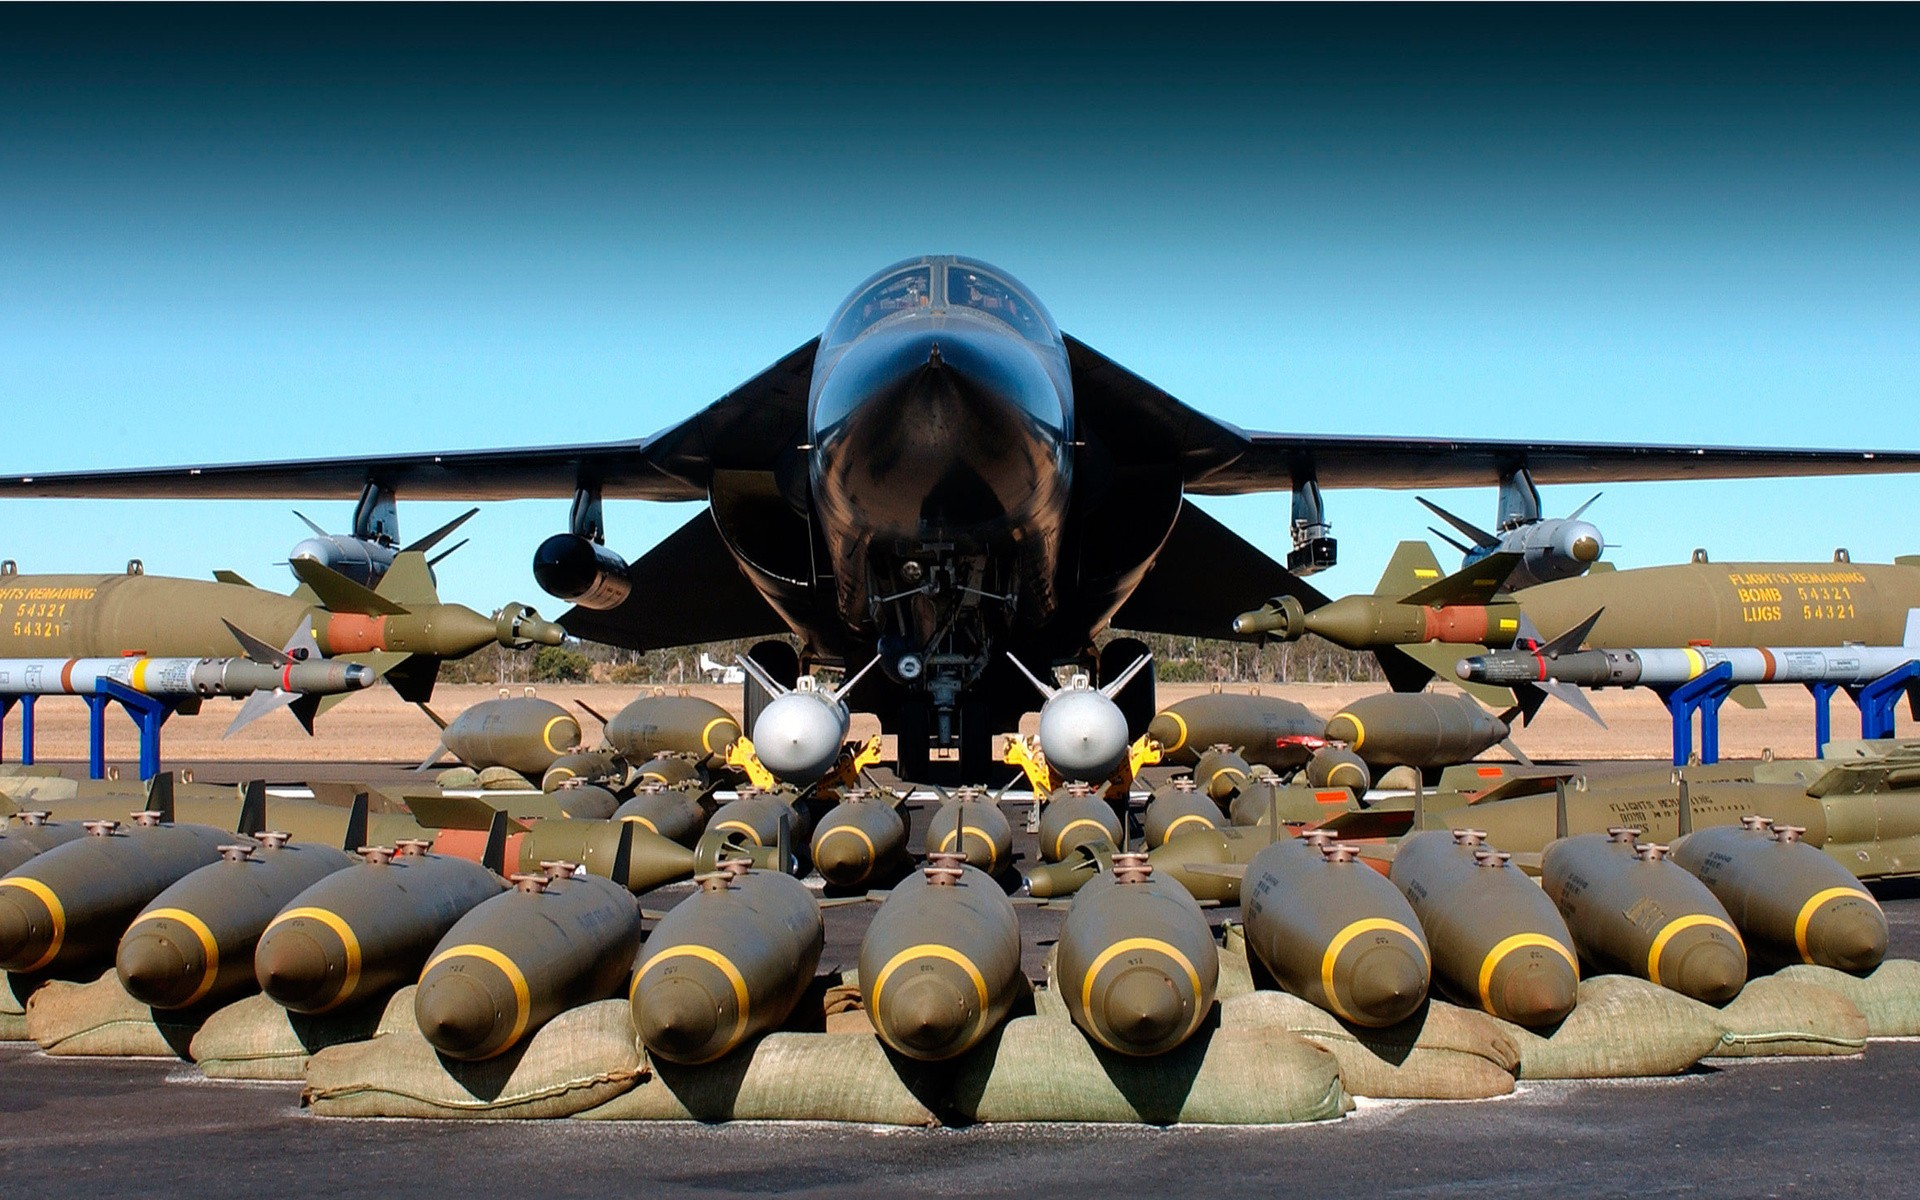 Avión bombardero - 1920x1200